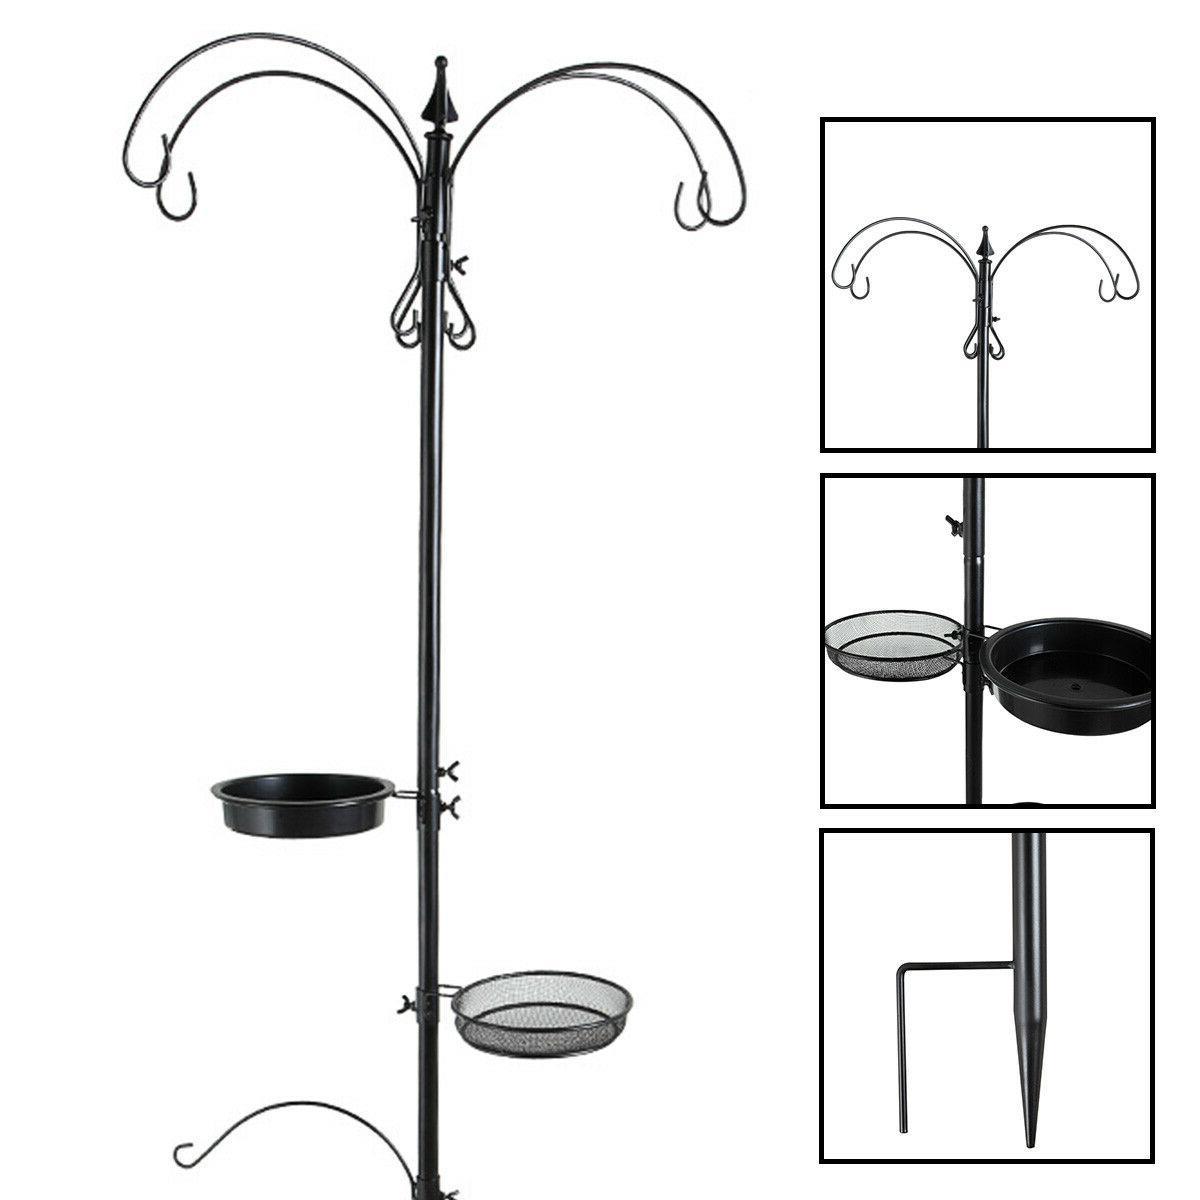 station hanging bird feeder pole mental stand